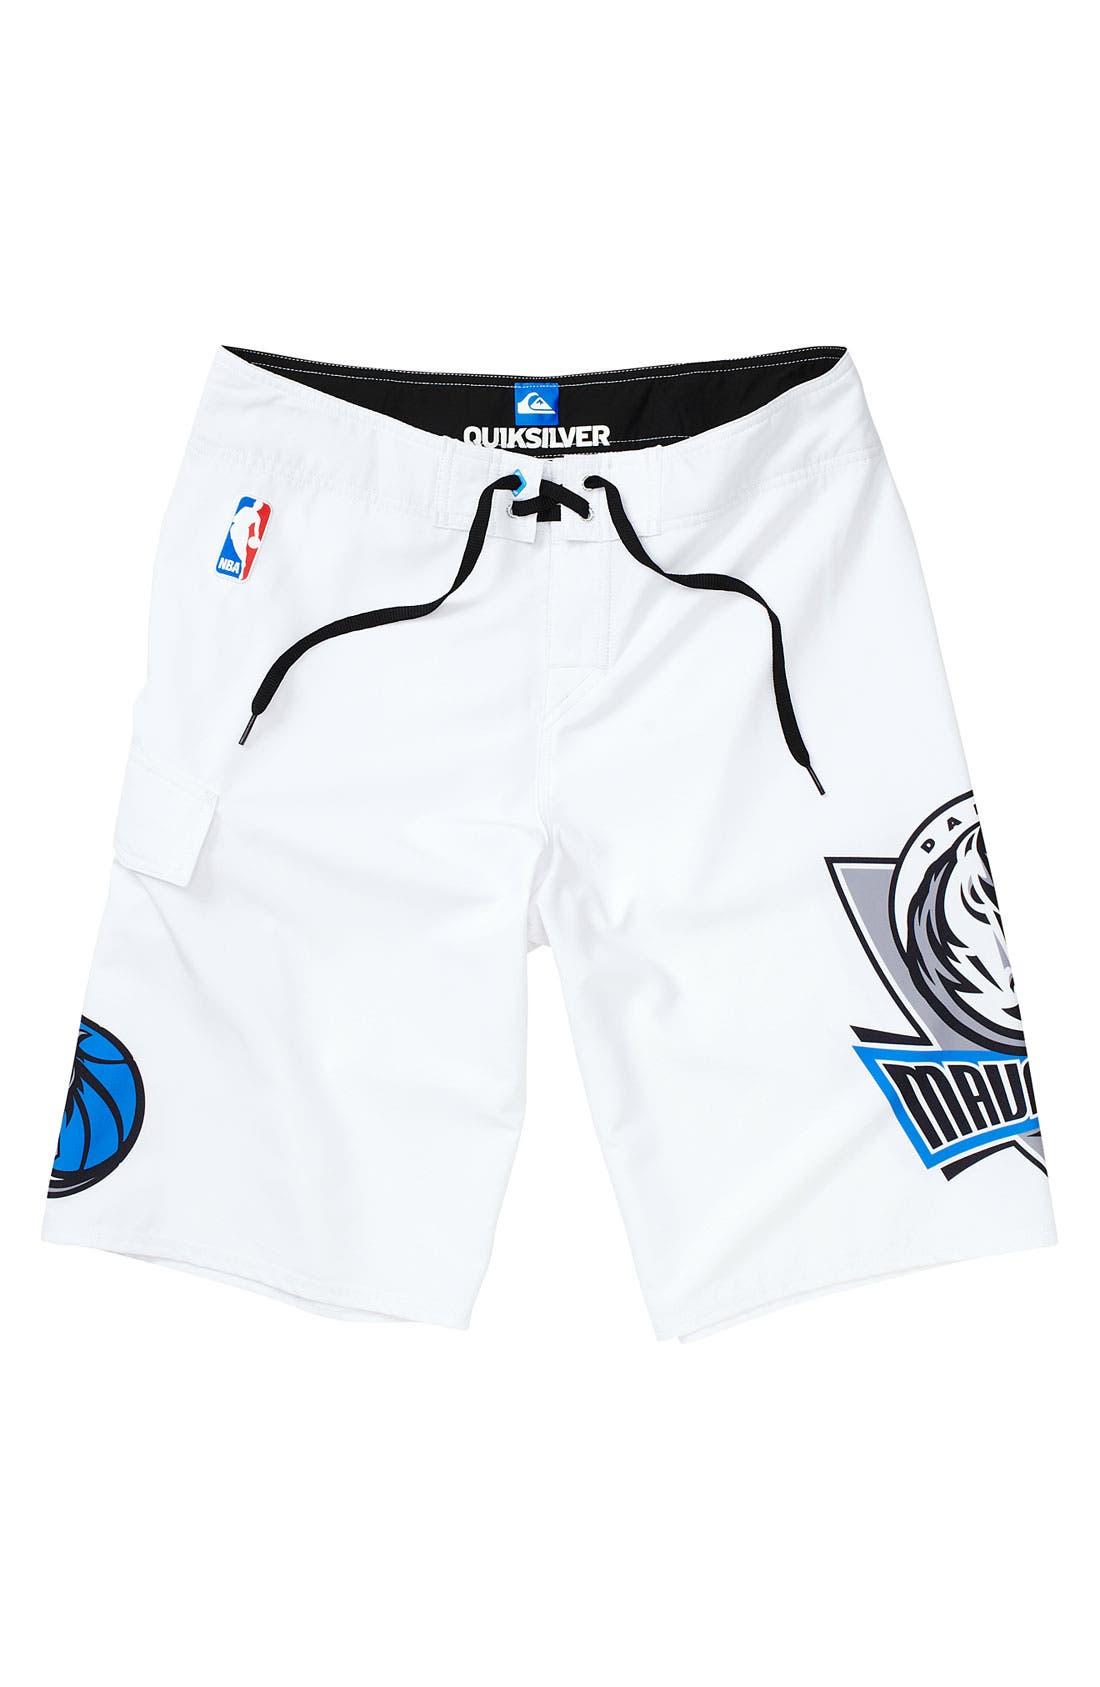 Alternate Image 1 Selected - Quiksilver 'Dallas Mavericks' Board Shorts (Big Boys)